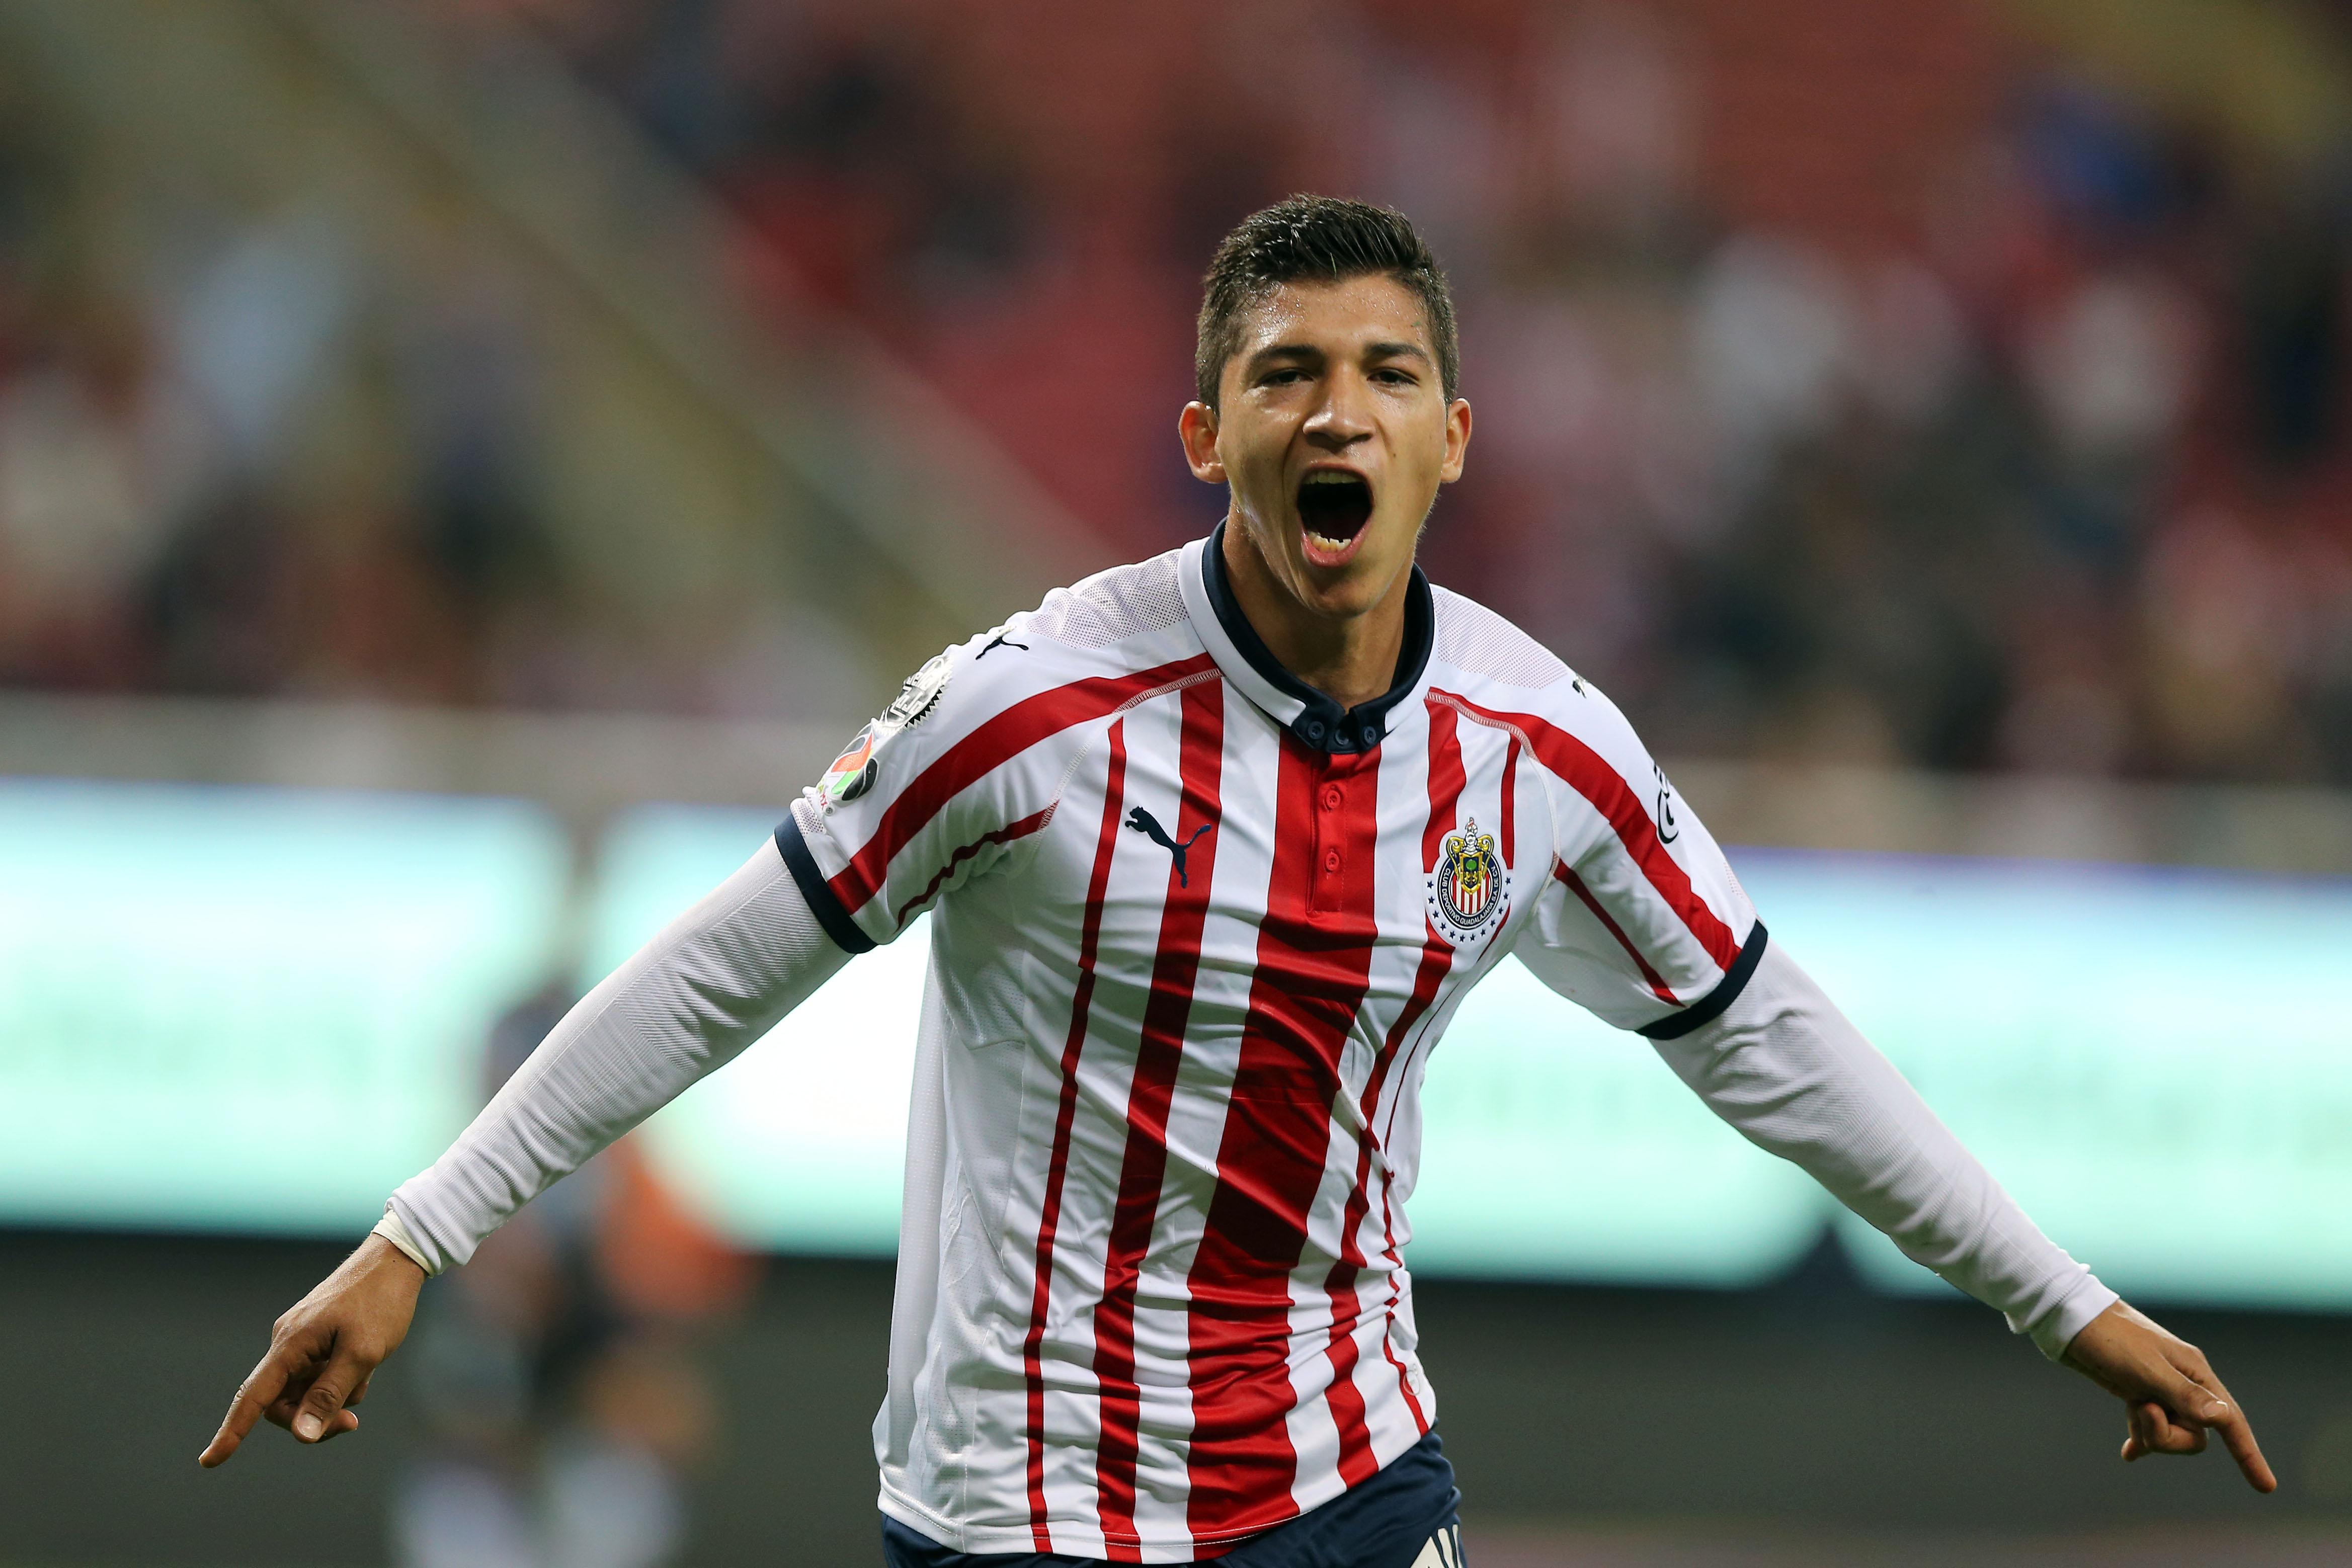 Chivas sacrificaría a Ángel Zaldívar para contratar a Luis Madrigal